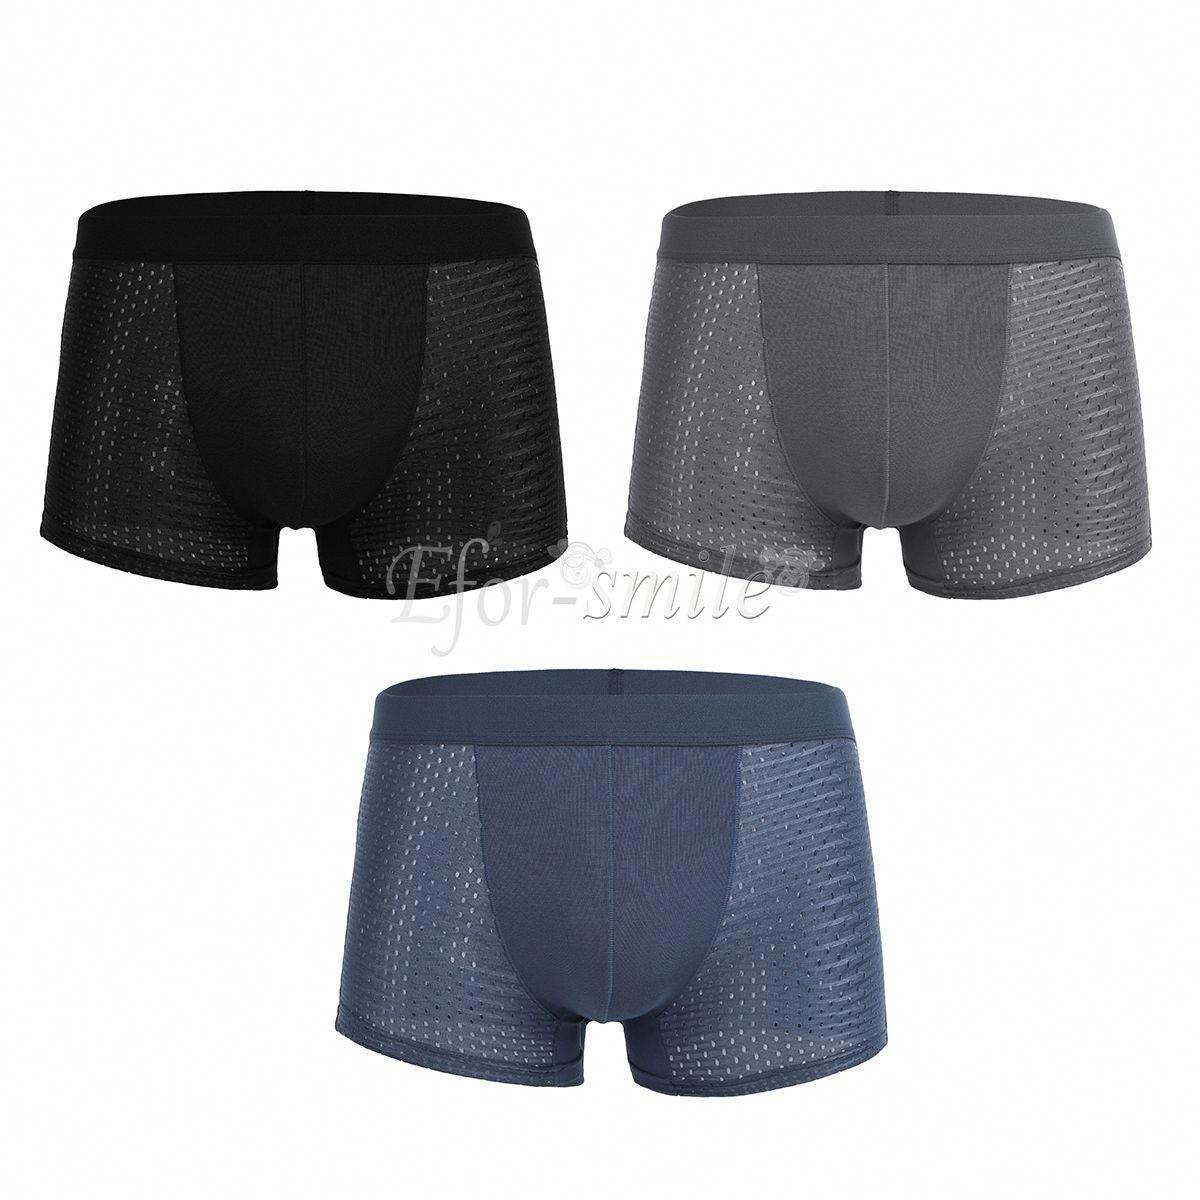 04969b1d90df18 Boxer Men Briefs Shorts Underwear Ice Silk Trunks Bulge Pouch Bikini  Underpants #ebay #Fashion #silkboxershorts